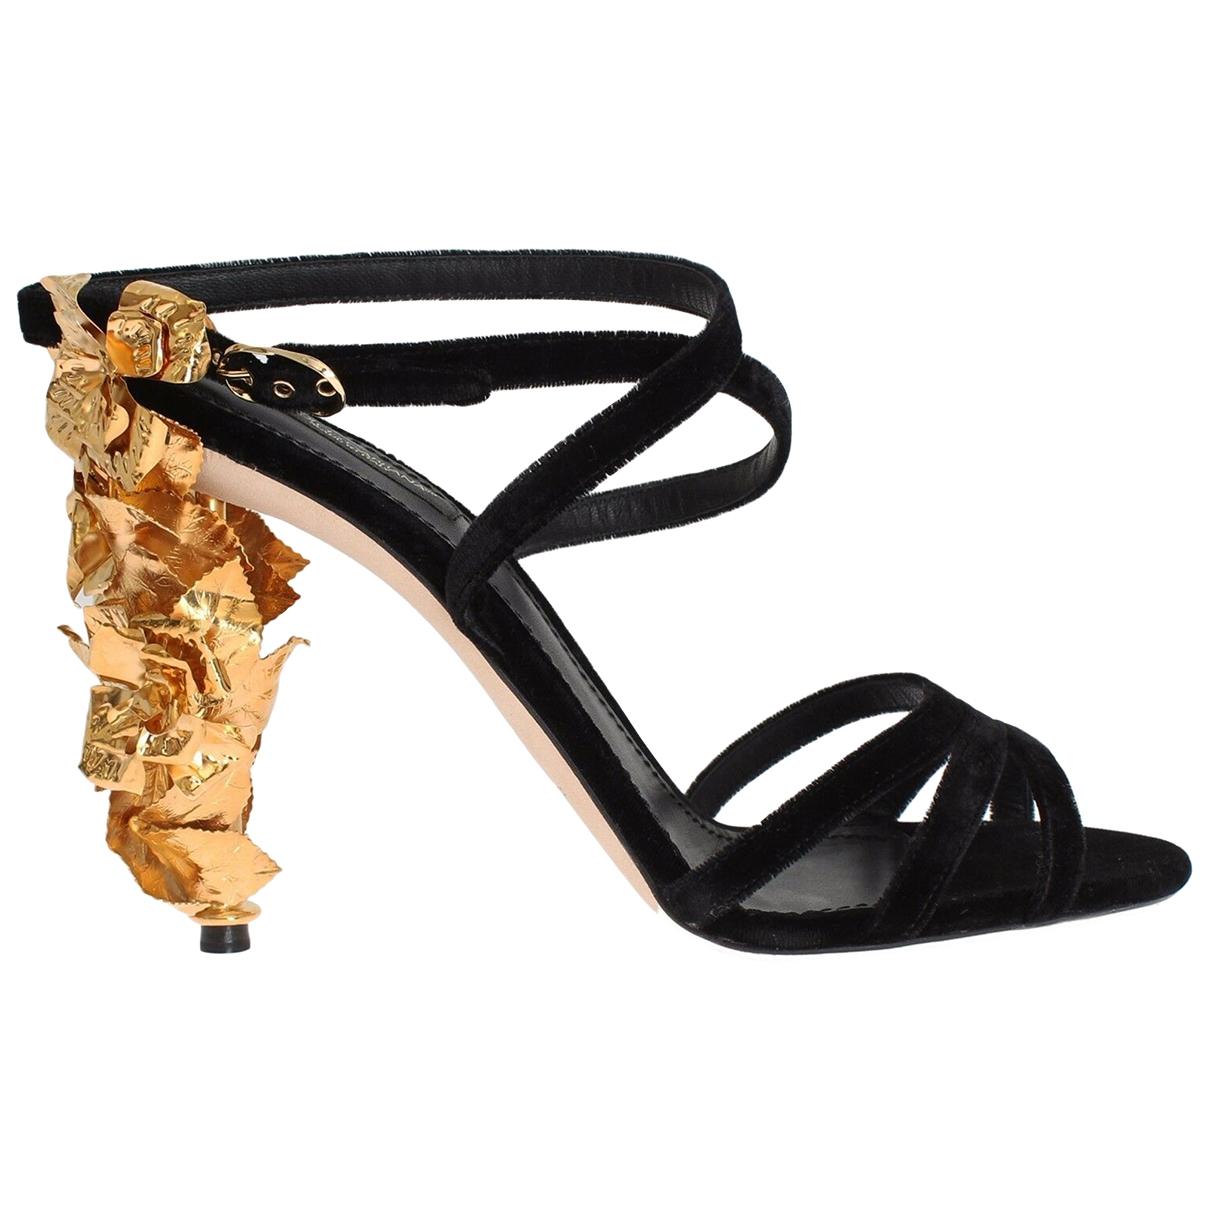 Dolce & Gabbana \N Black Suede Sandals for Women 40 EU